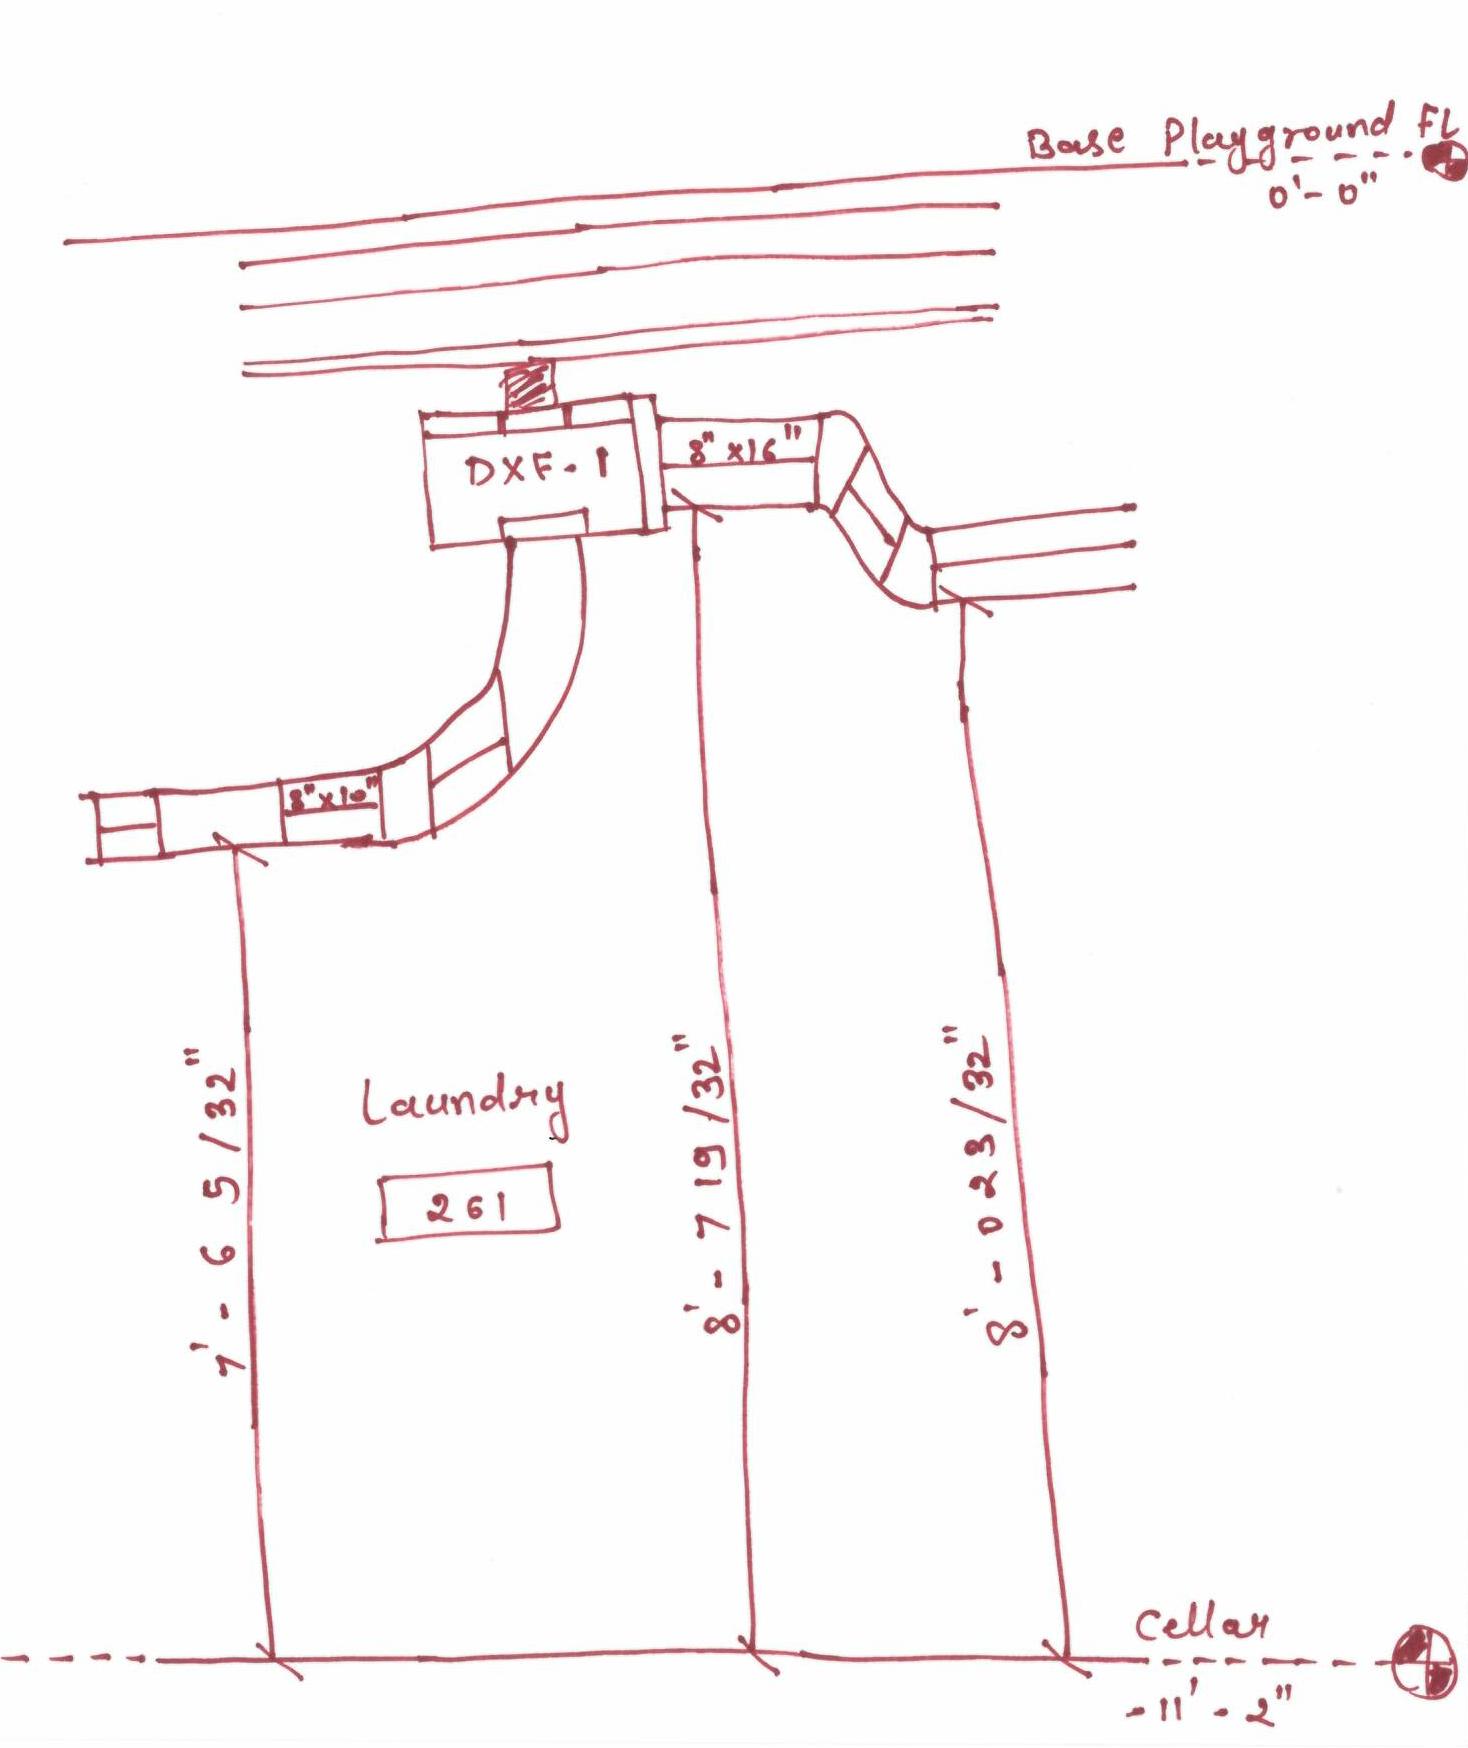 Redline-markup-step1